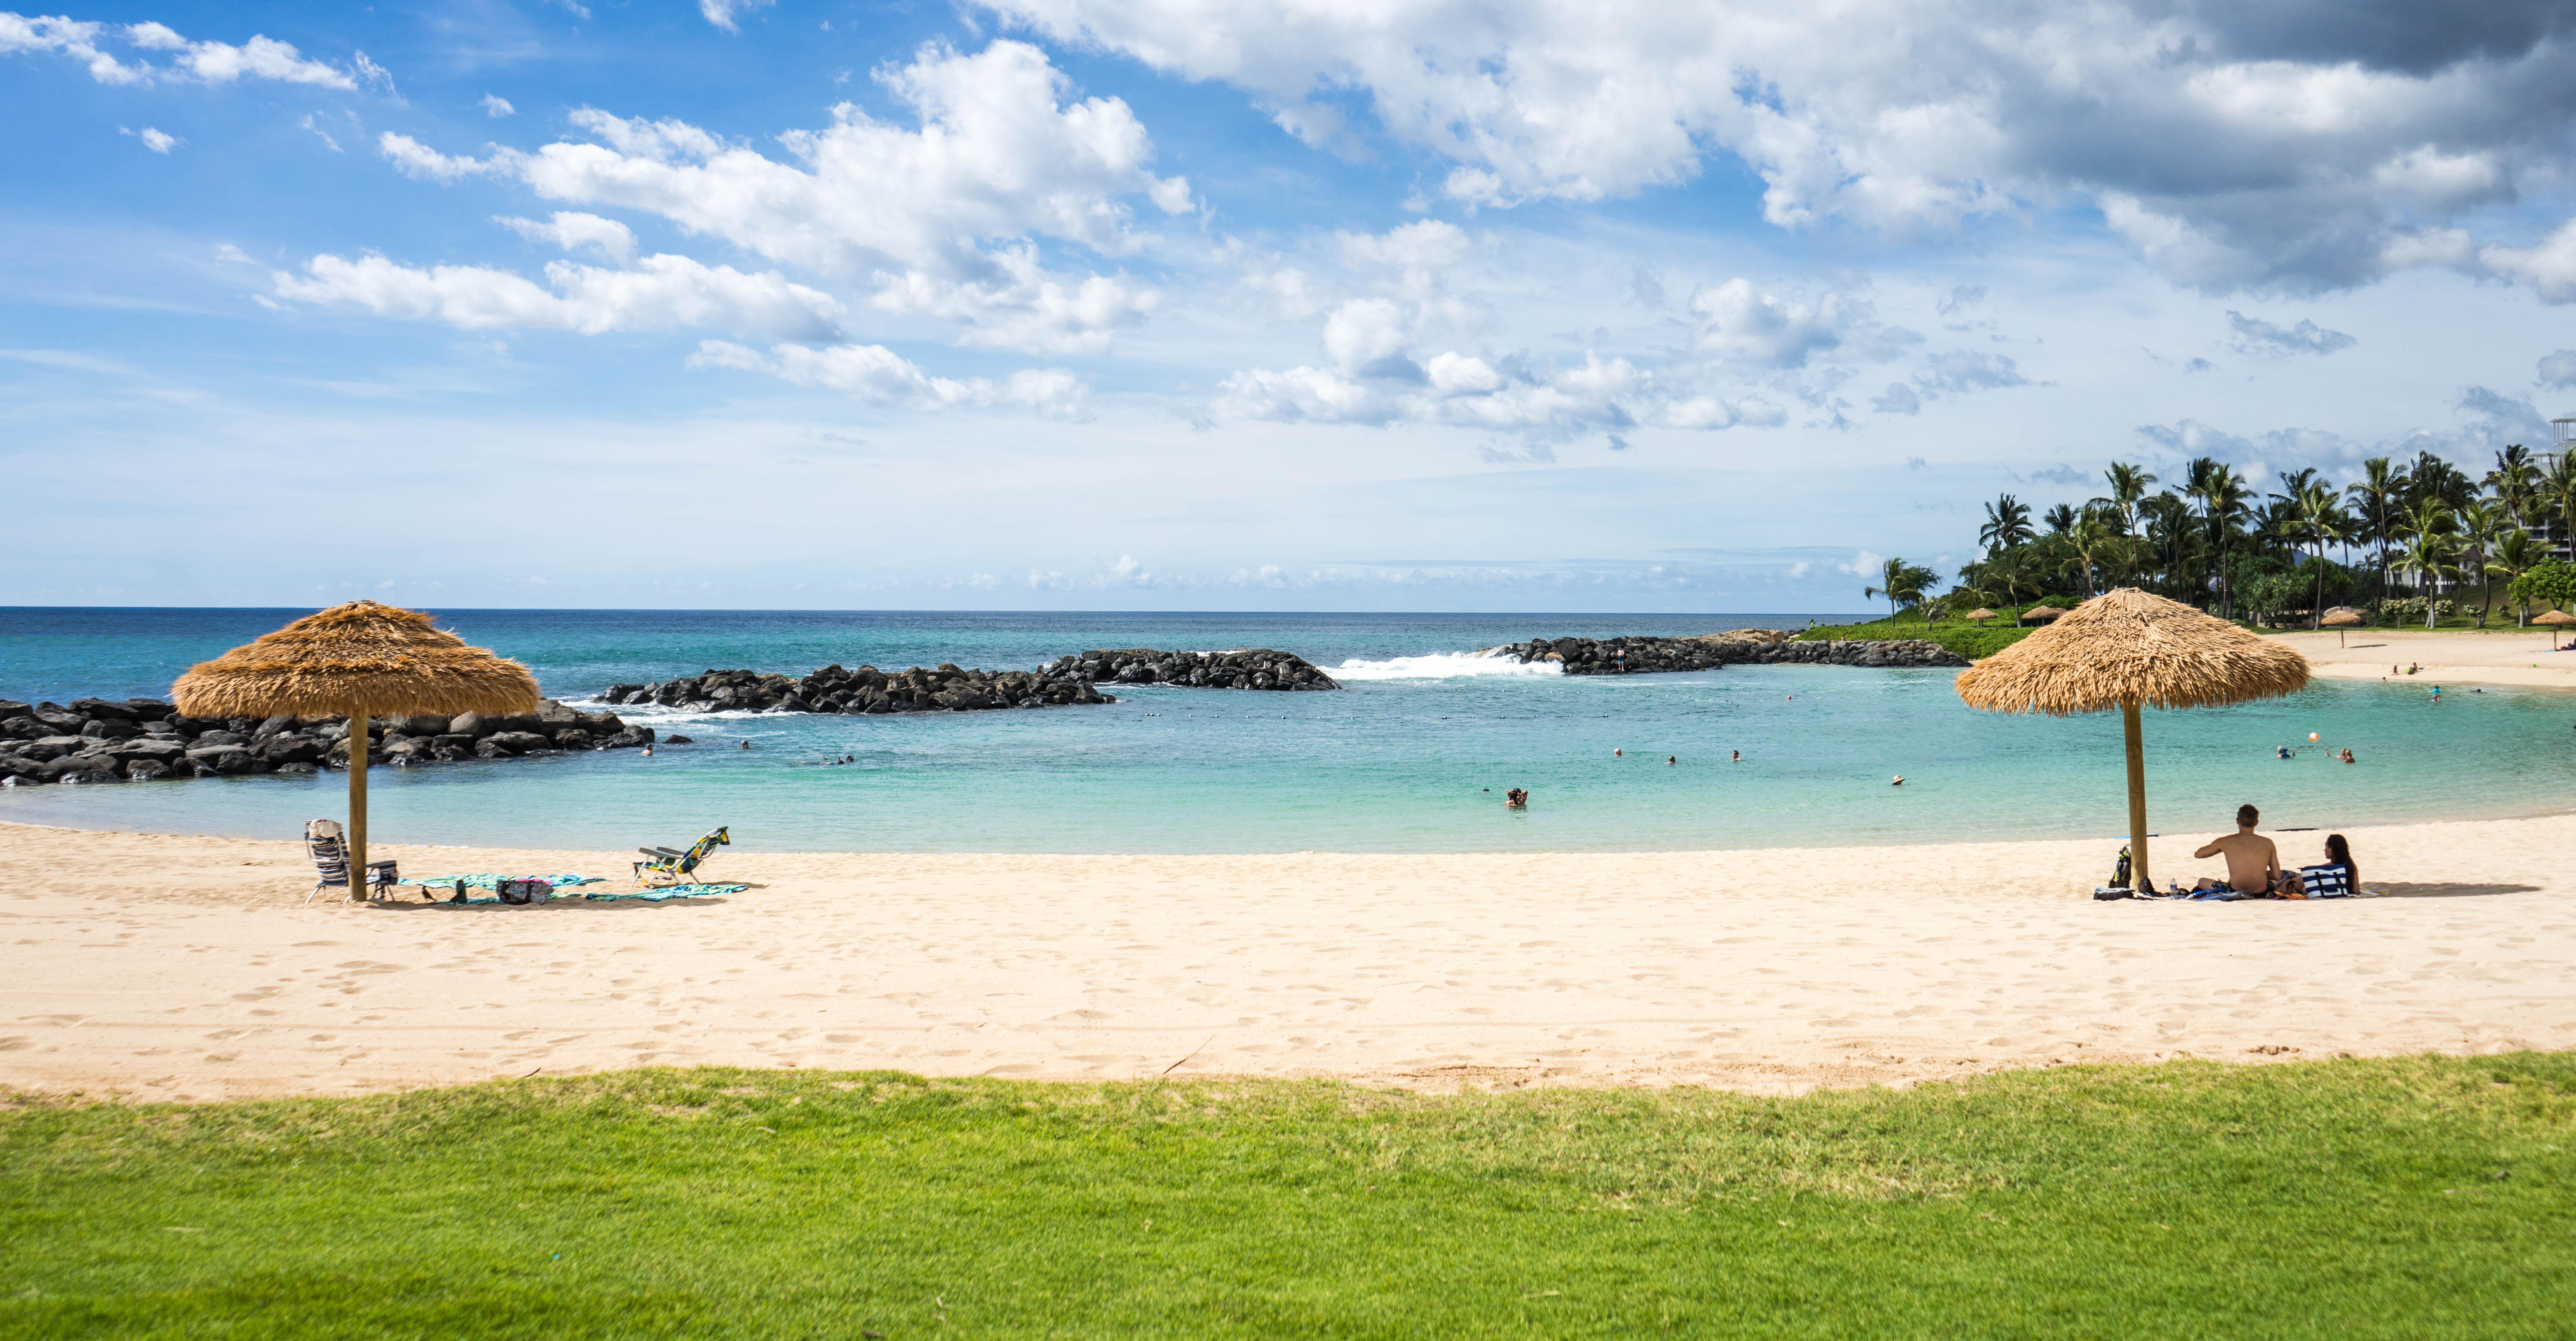 Vacation Travel Cove Seascape Lagoon Bay Island Body Of Water Blue Sky Sunny Clouds Caribbean Tropics Cape Huts Marriott Hawaii Beach